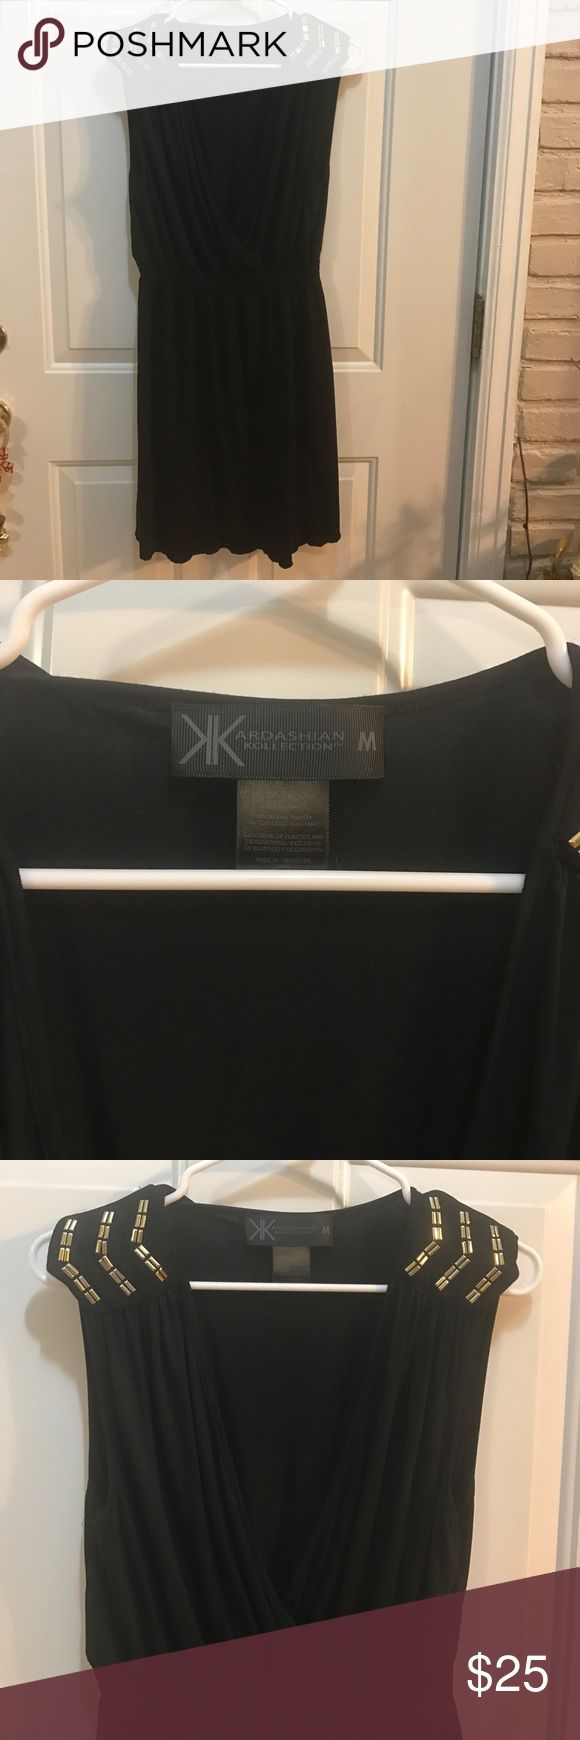 Kardashian kollection dress Kardashian kollection black dress w/ gold on shoulder, size medium never worn Kardashian Kollection Dresses Mini